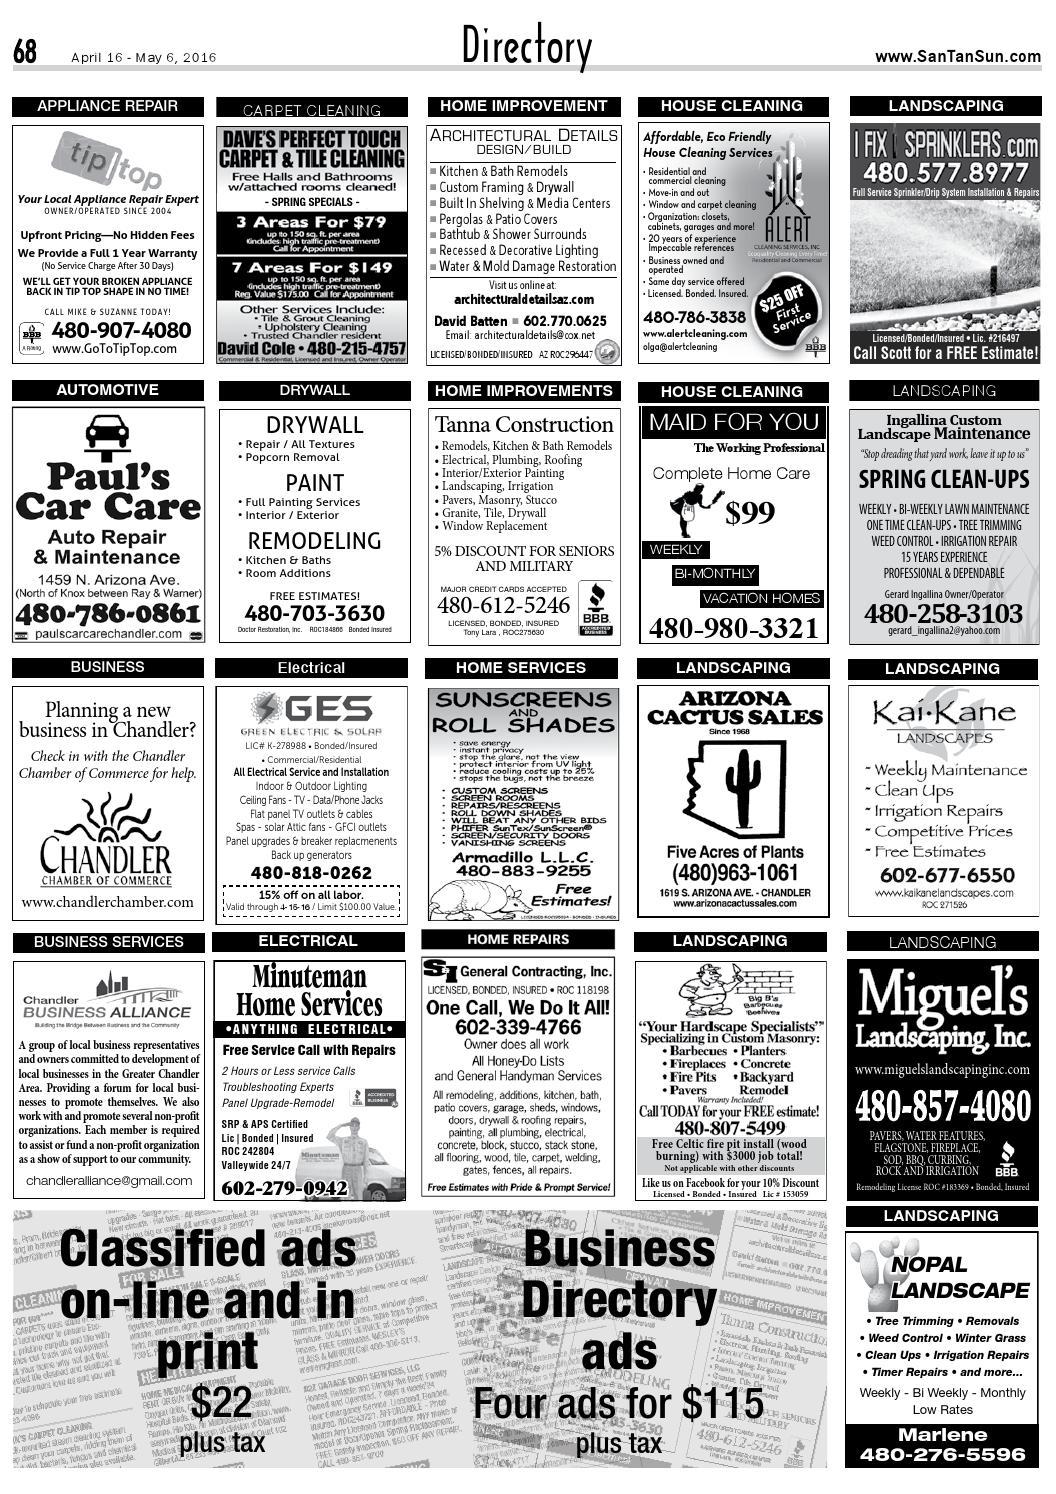 SanTan Sun News: Directory Classifieds - April 16, 2016 by